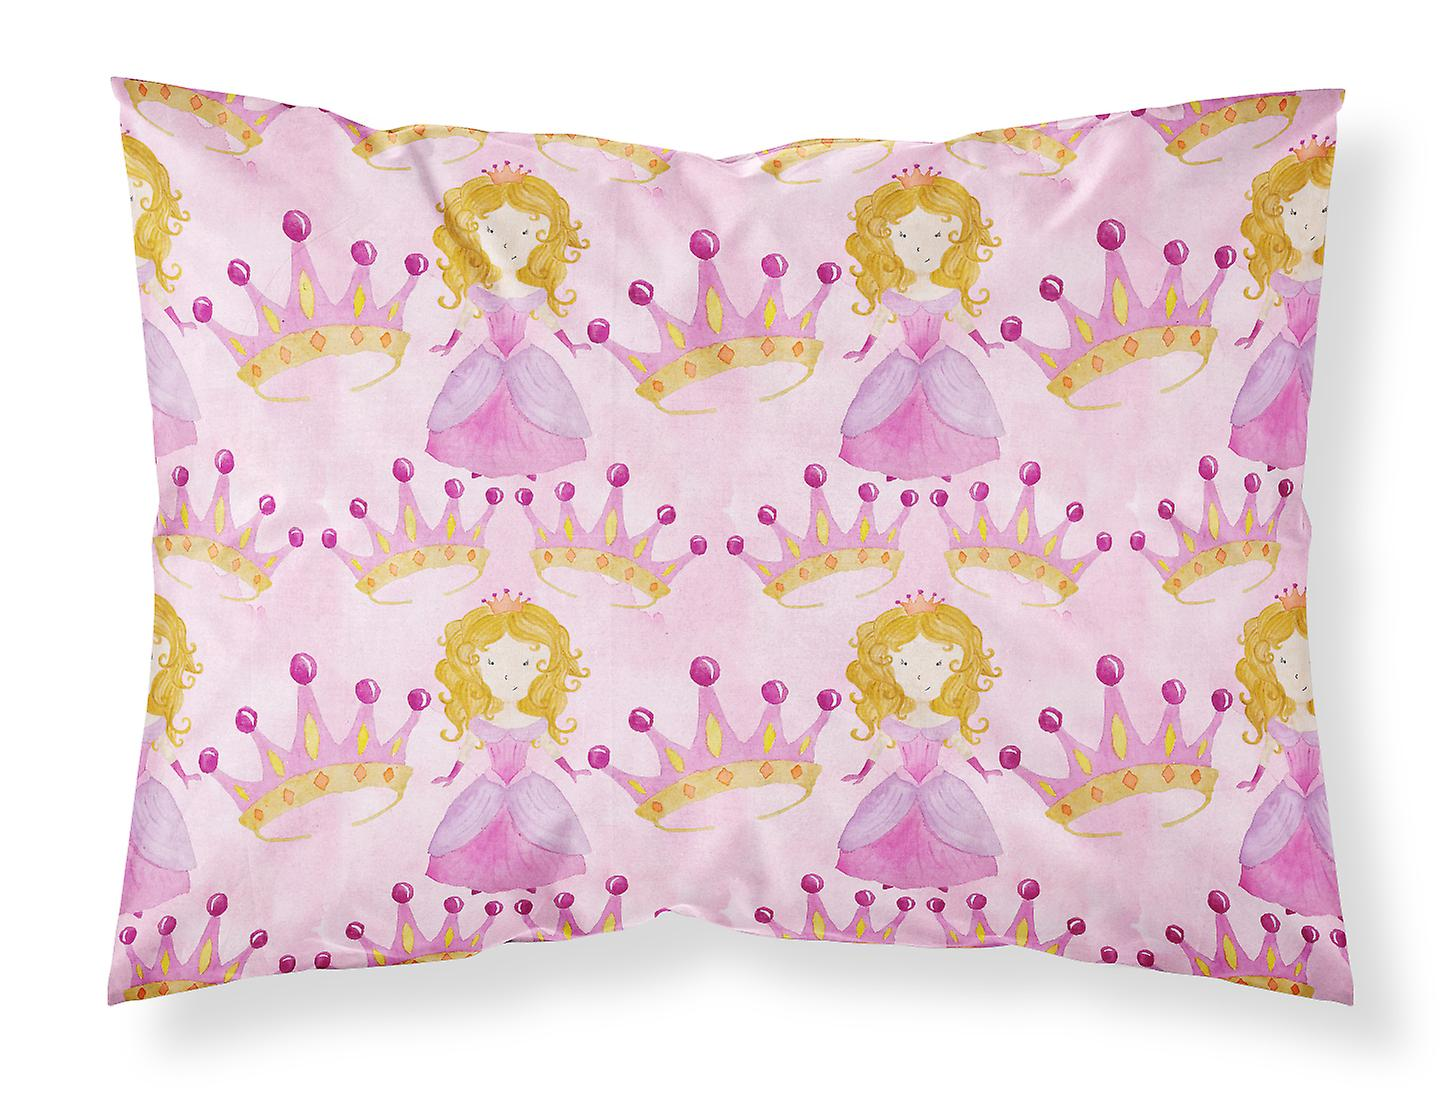 Princesse Aquarelle Taie Et D'oreiller Tissu Standard Couronne IWHYDE29